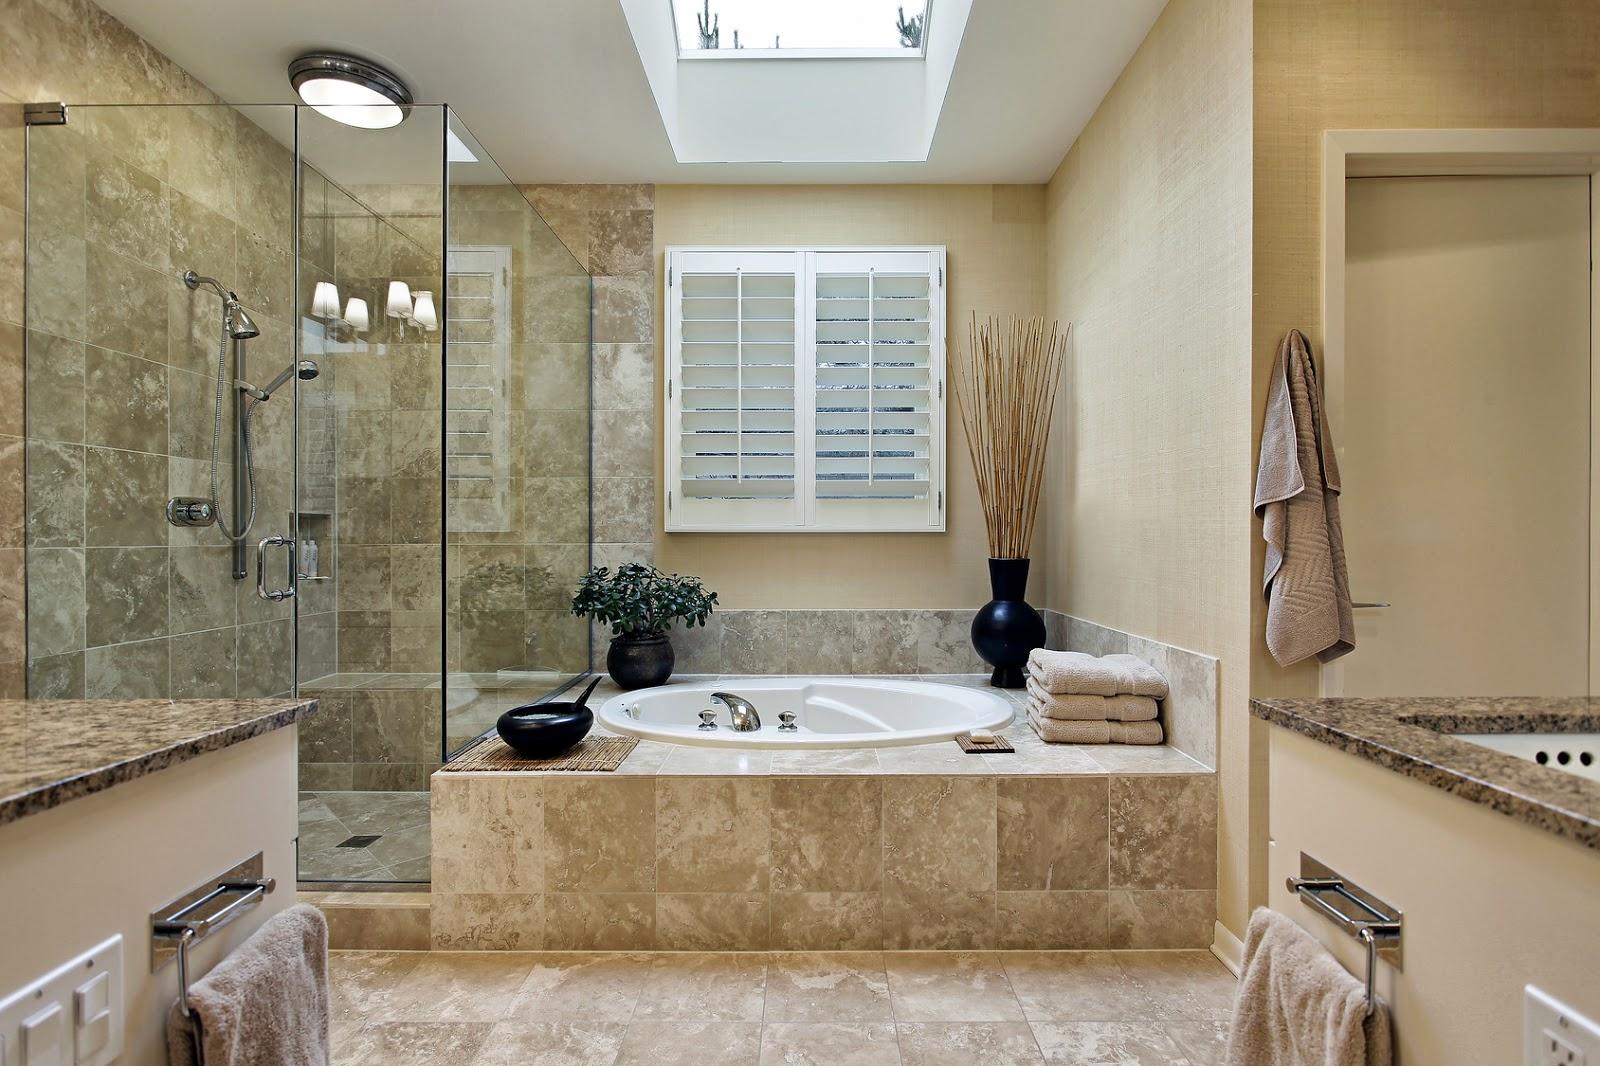 Bathroom Remodel 8 X 8 flooring fanatic: dreaming of a new bathroom?